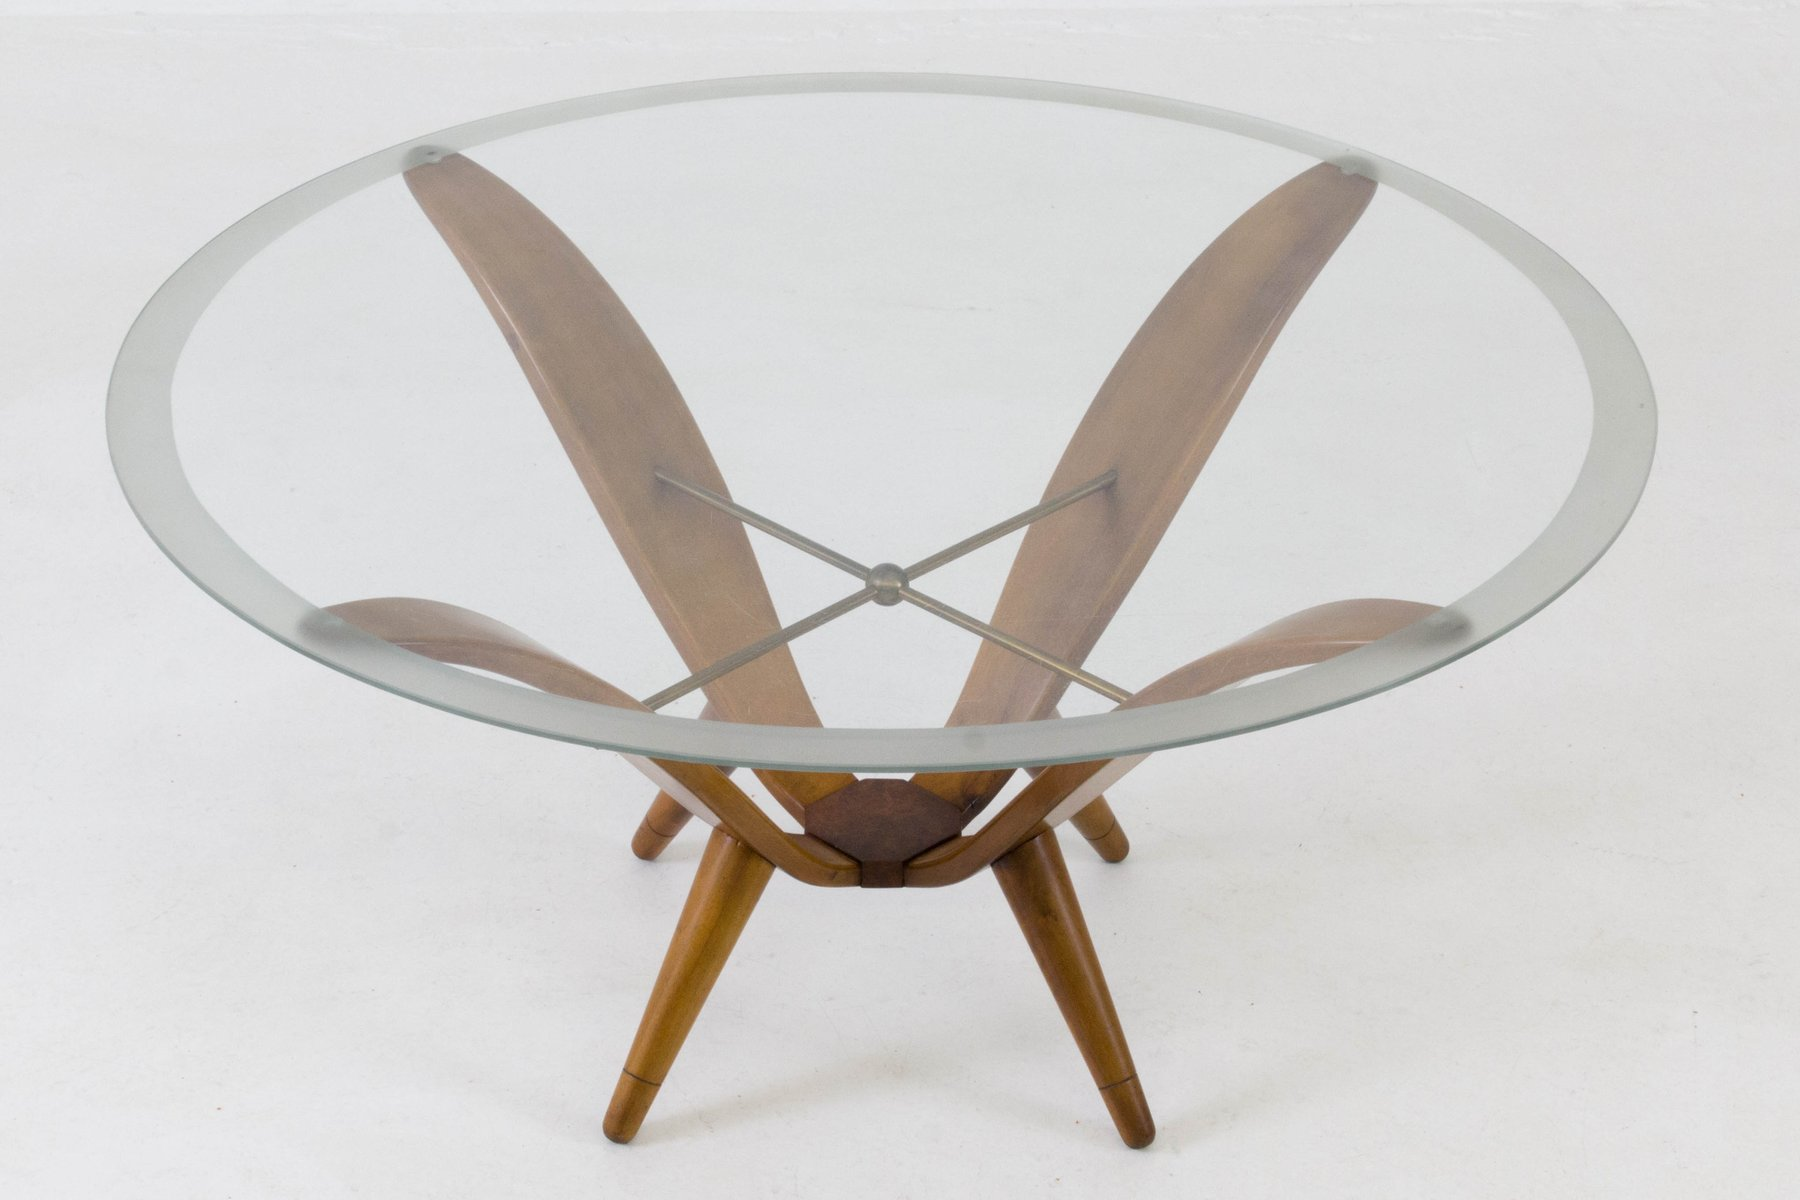 Italian Mid Century Modern Coffee Table 1950s for sale at Pamono